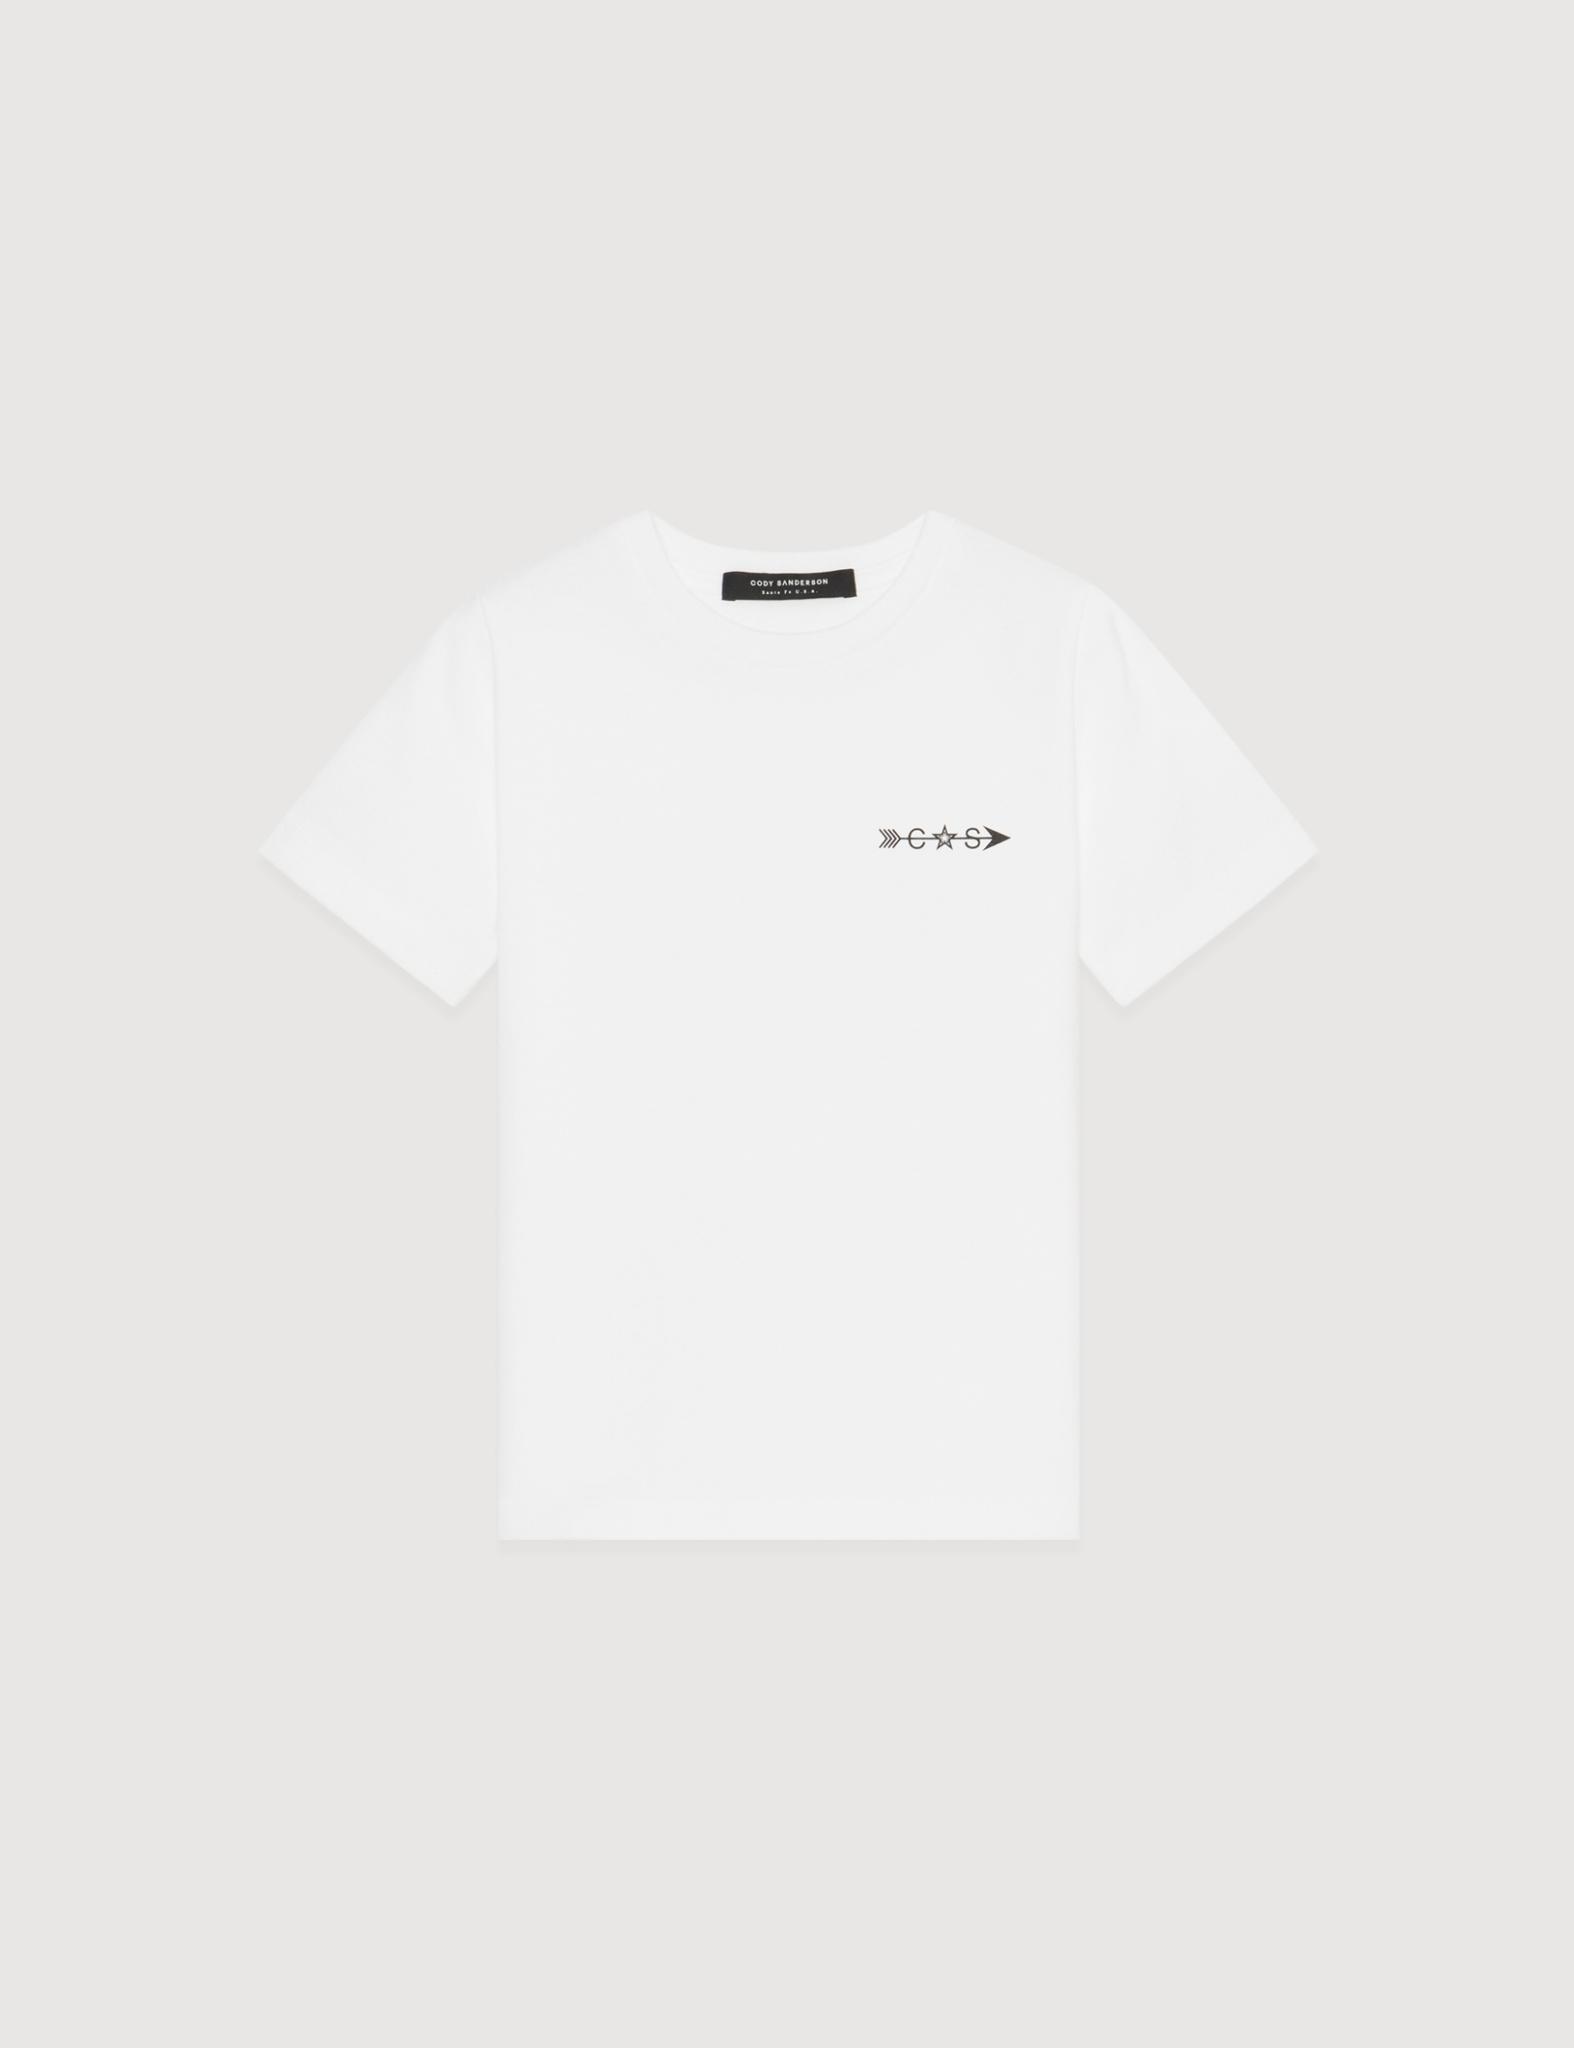 STAR LINE KID TEE (WHITE)     [USD $130]